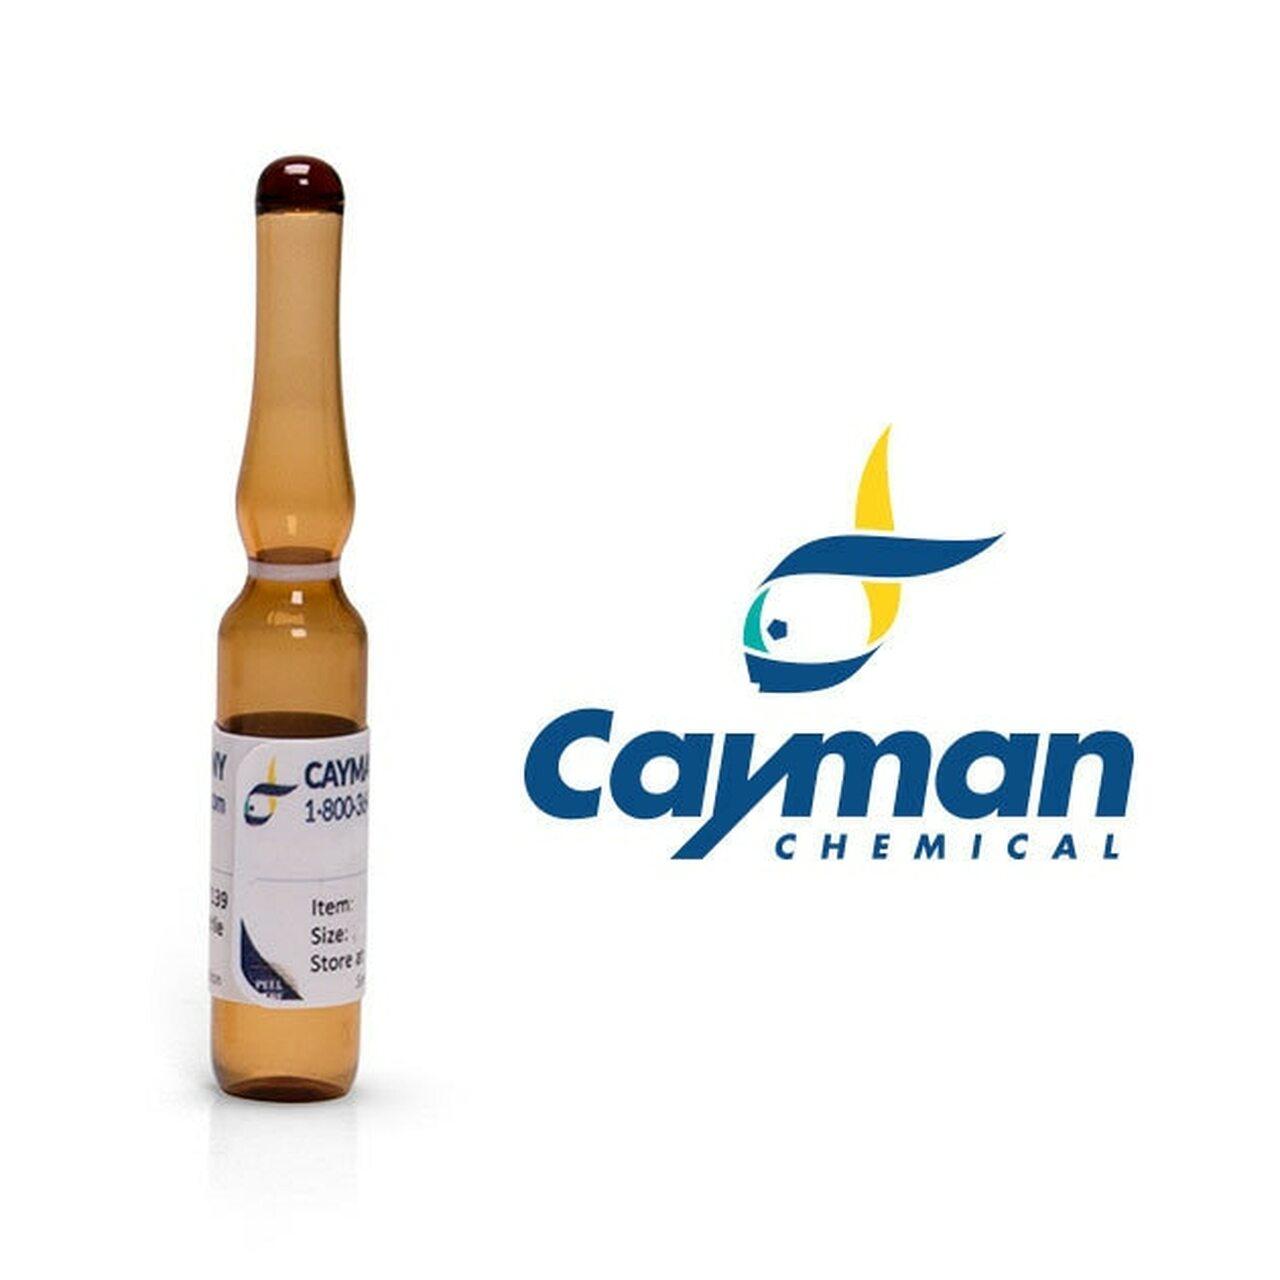 شرکت شیمیایی Cayman Chemical